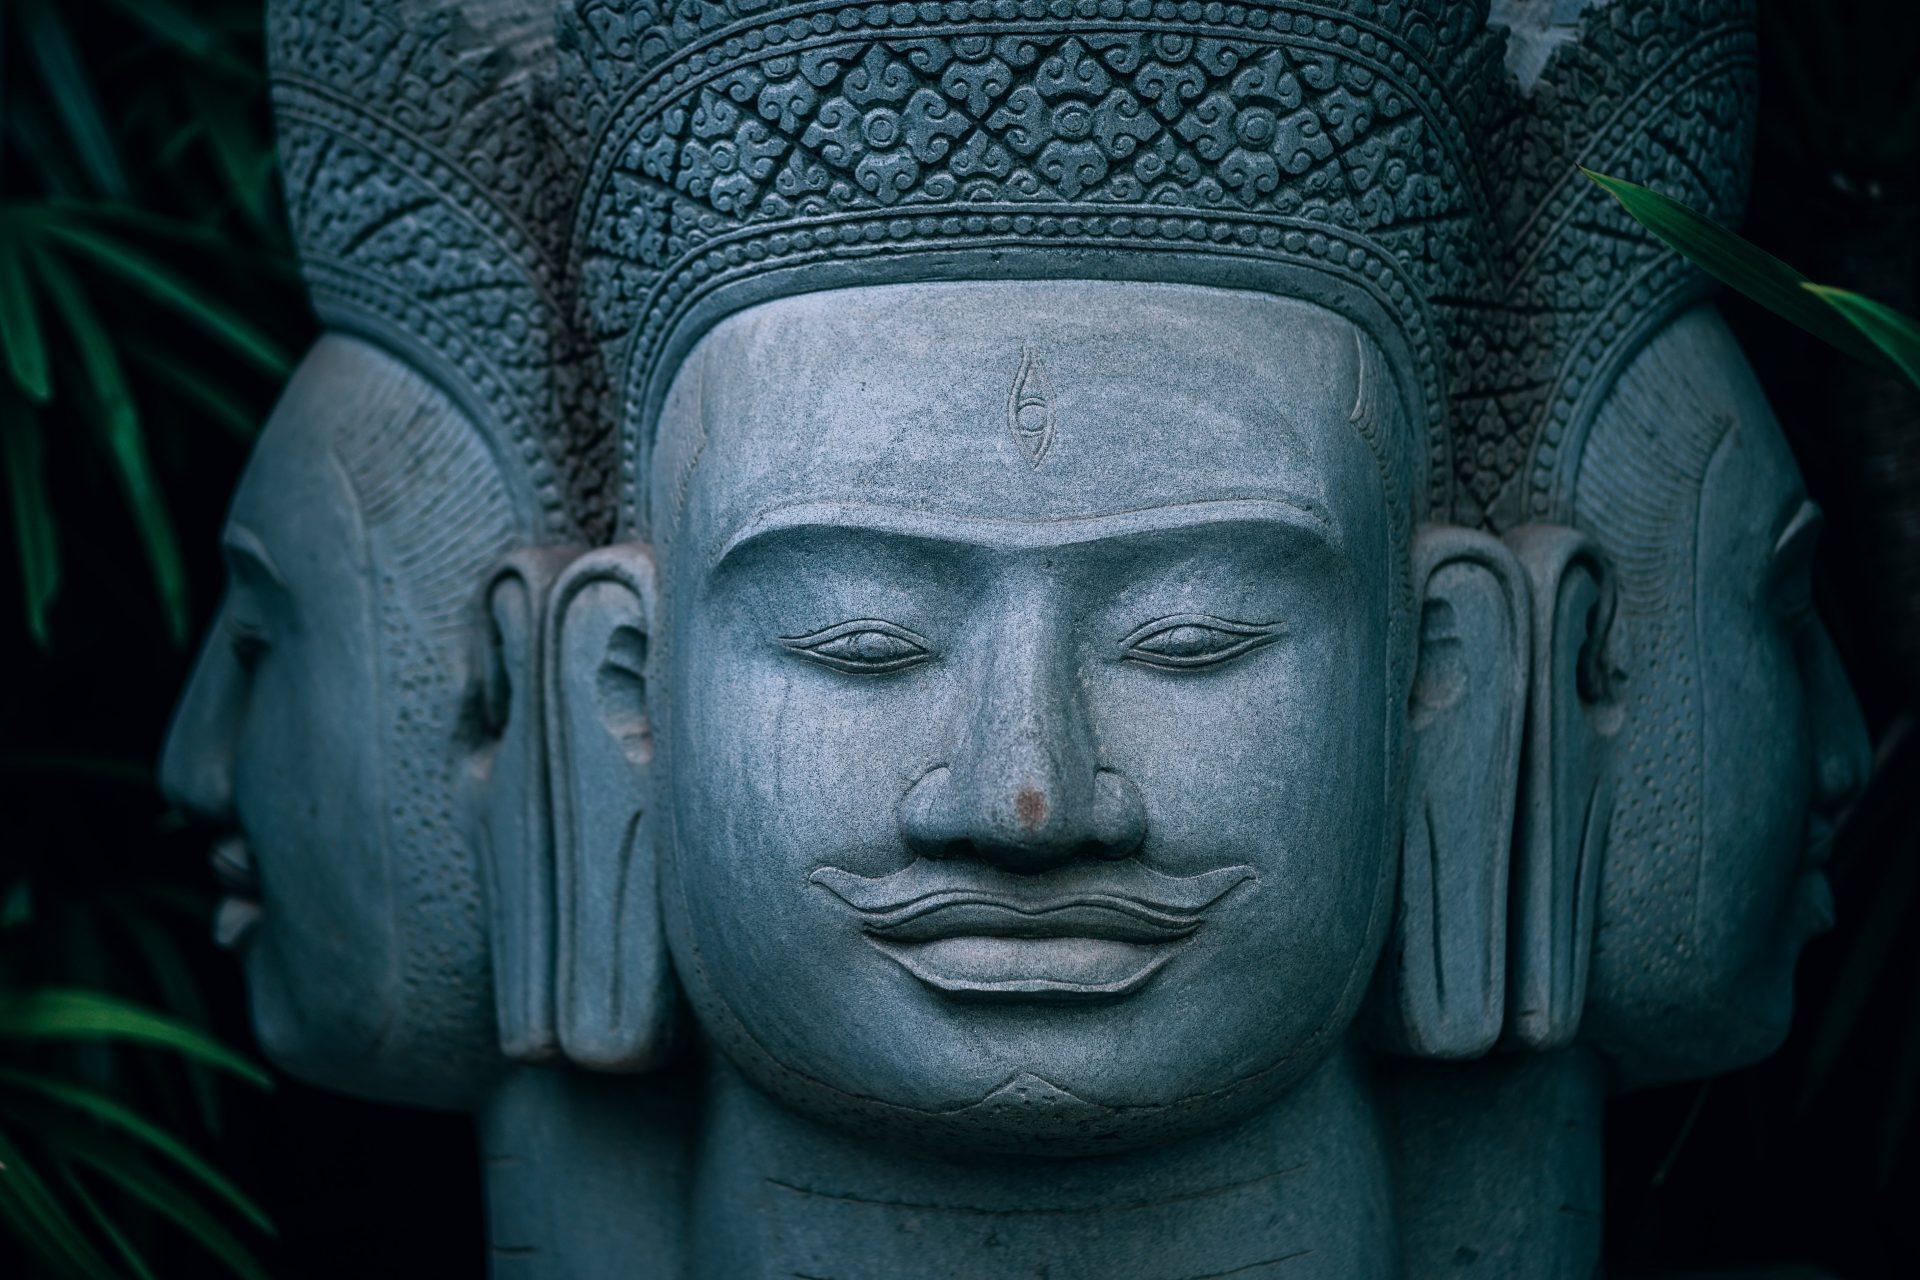 Empedokles'in Dostları three headed buddha statue B9PG9NL 1920x1280